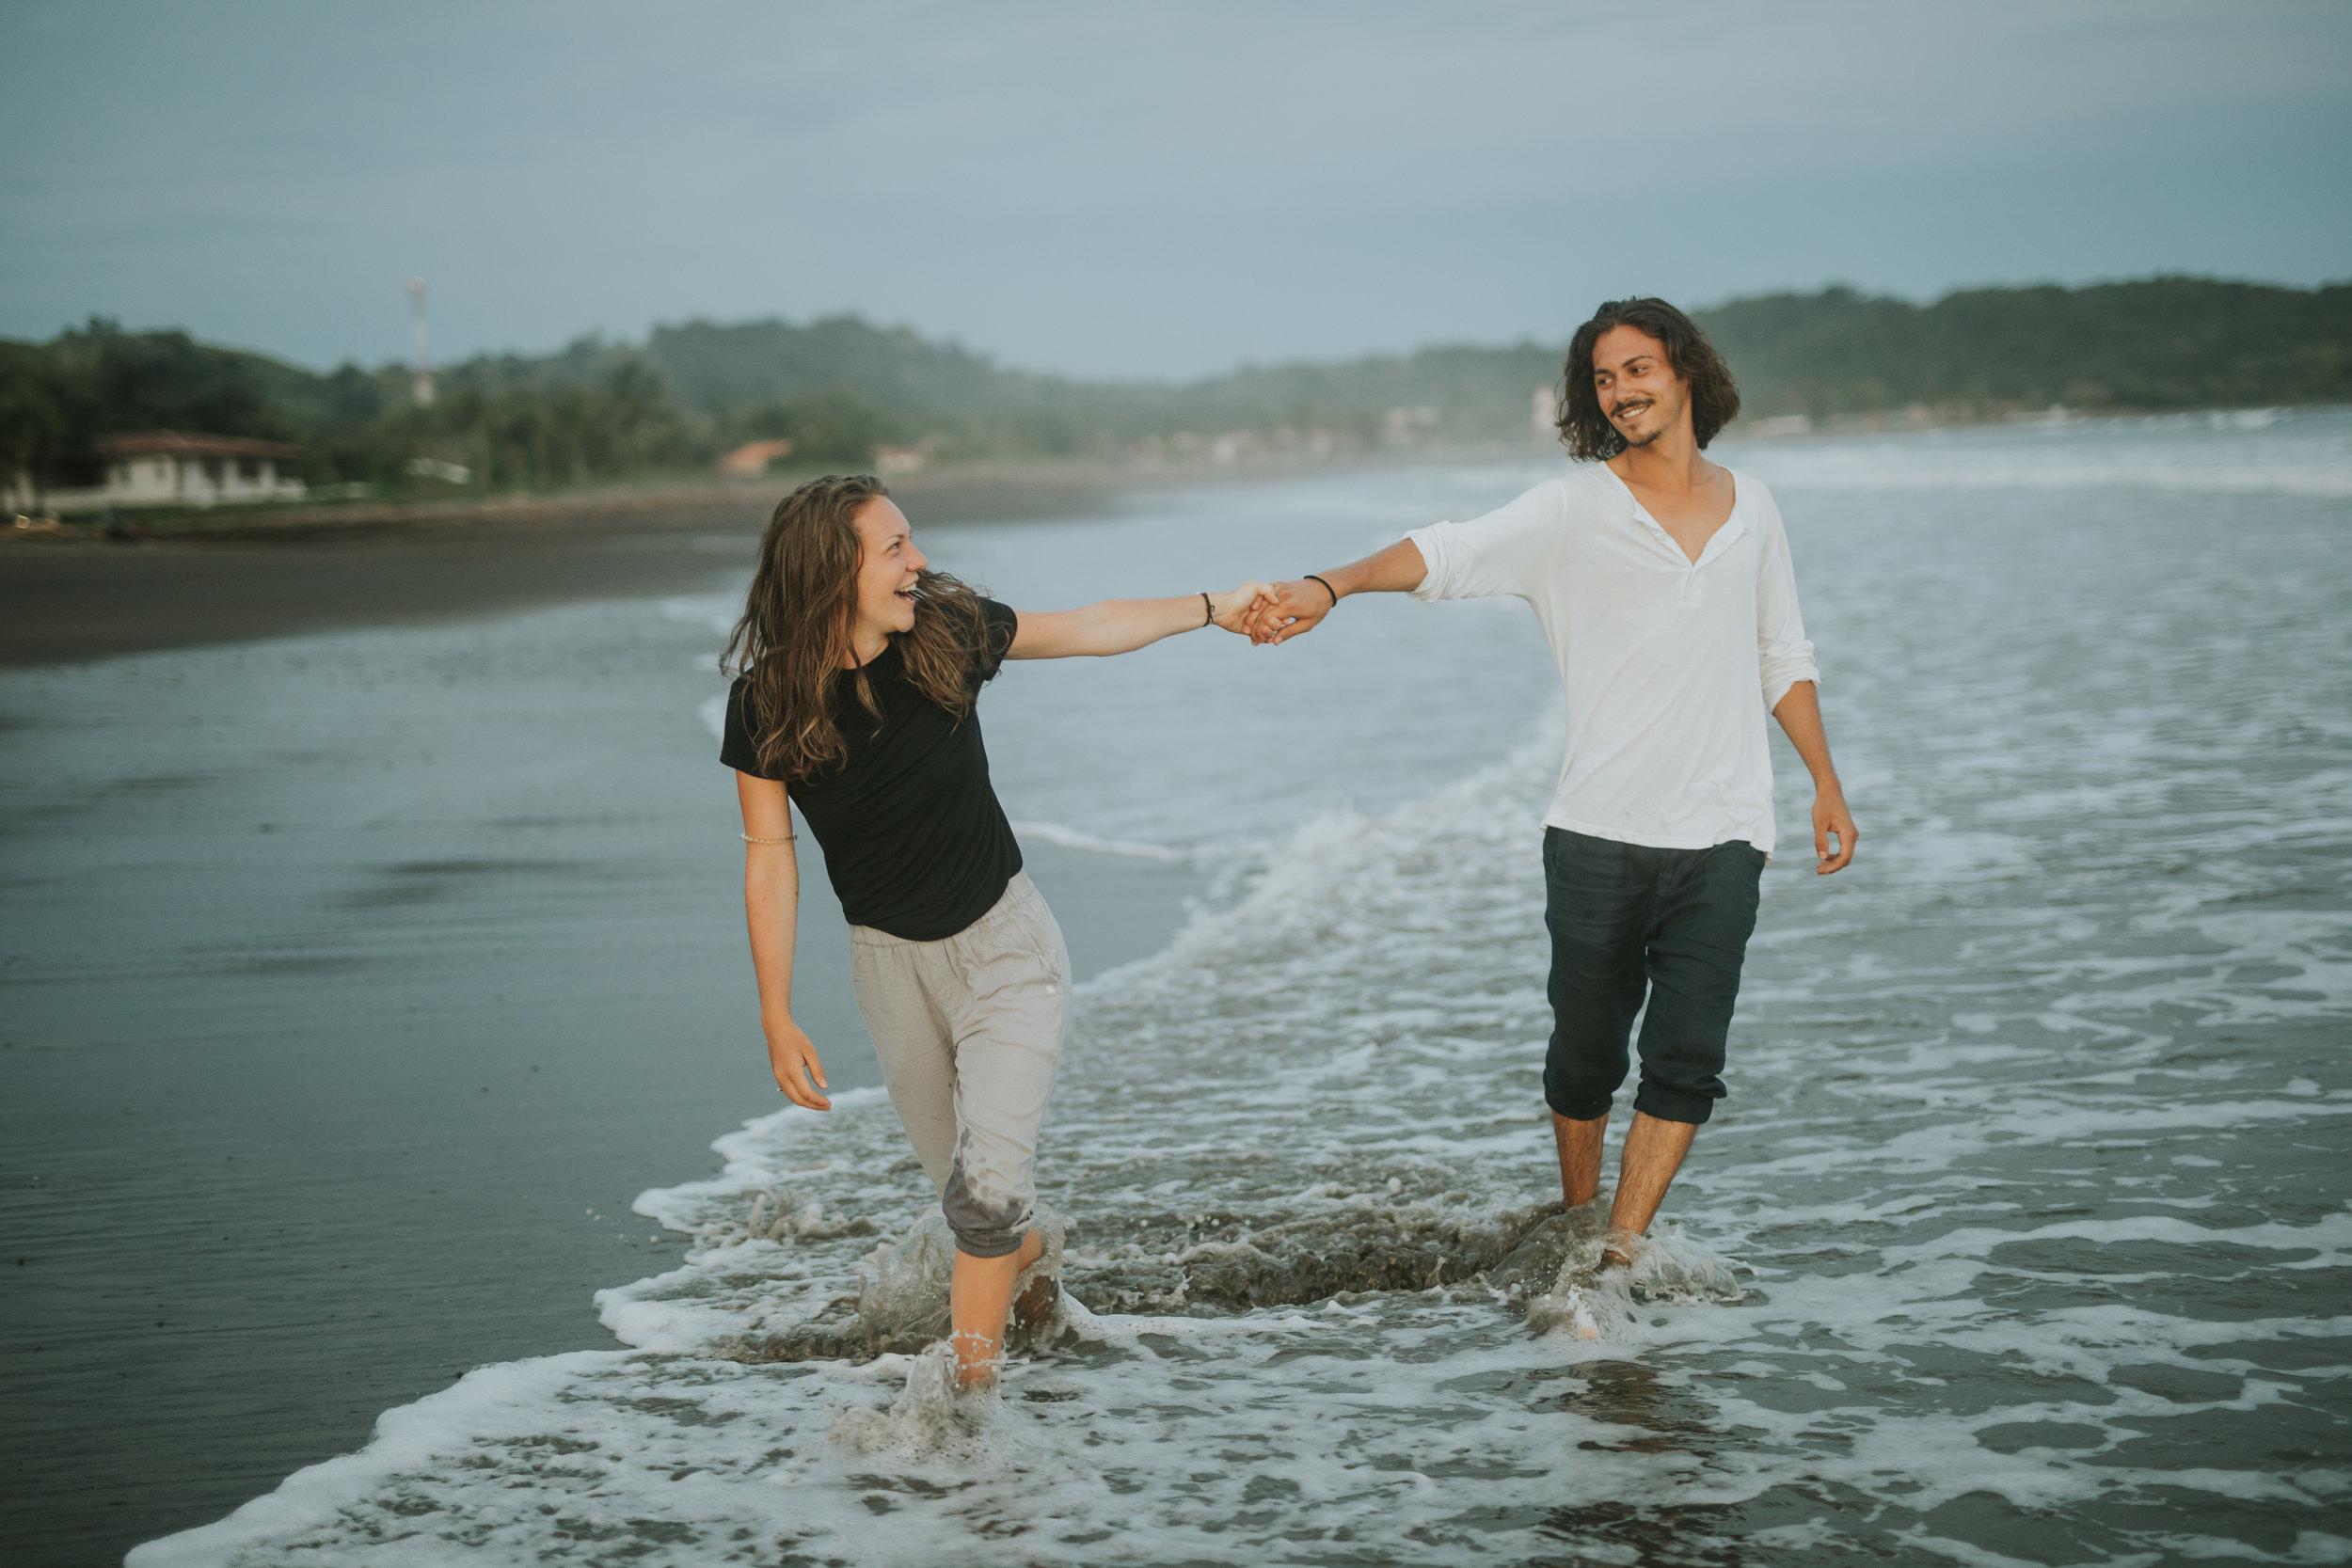 Panama Beach Engagement_Polly C Photography_20171707183609.jpg